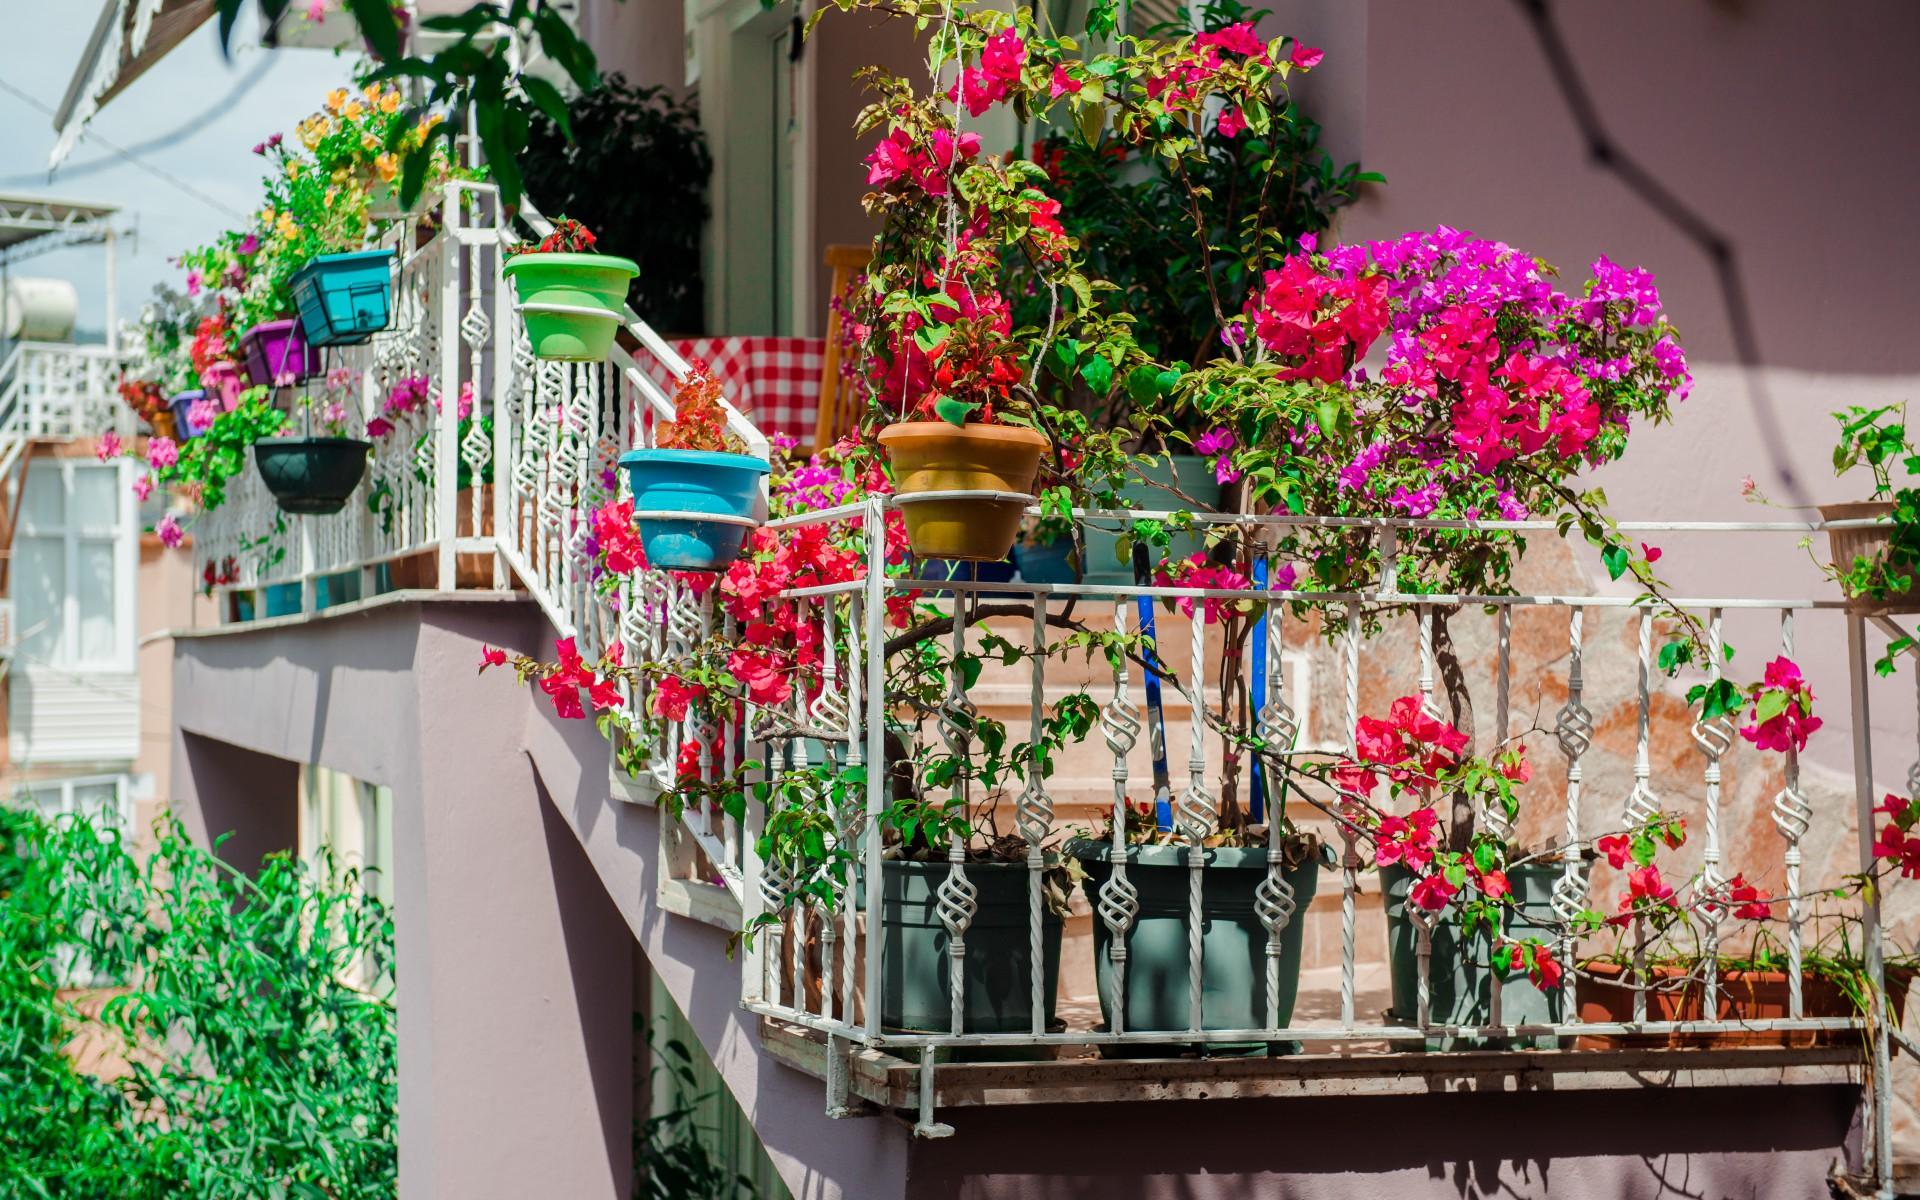 Цветы на балконе - стоковое фото amoklv #32311837.